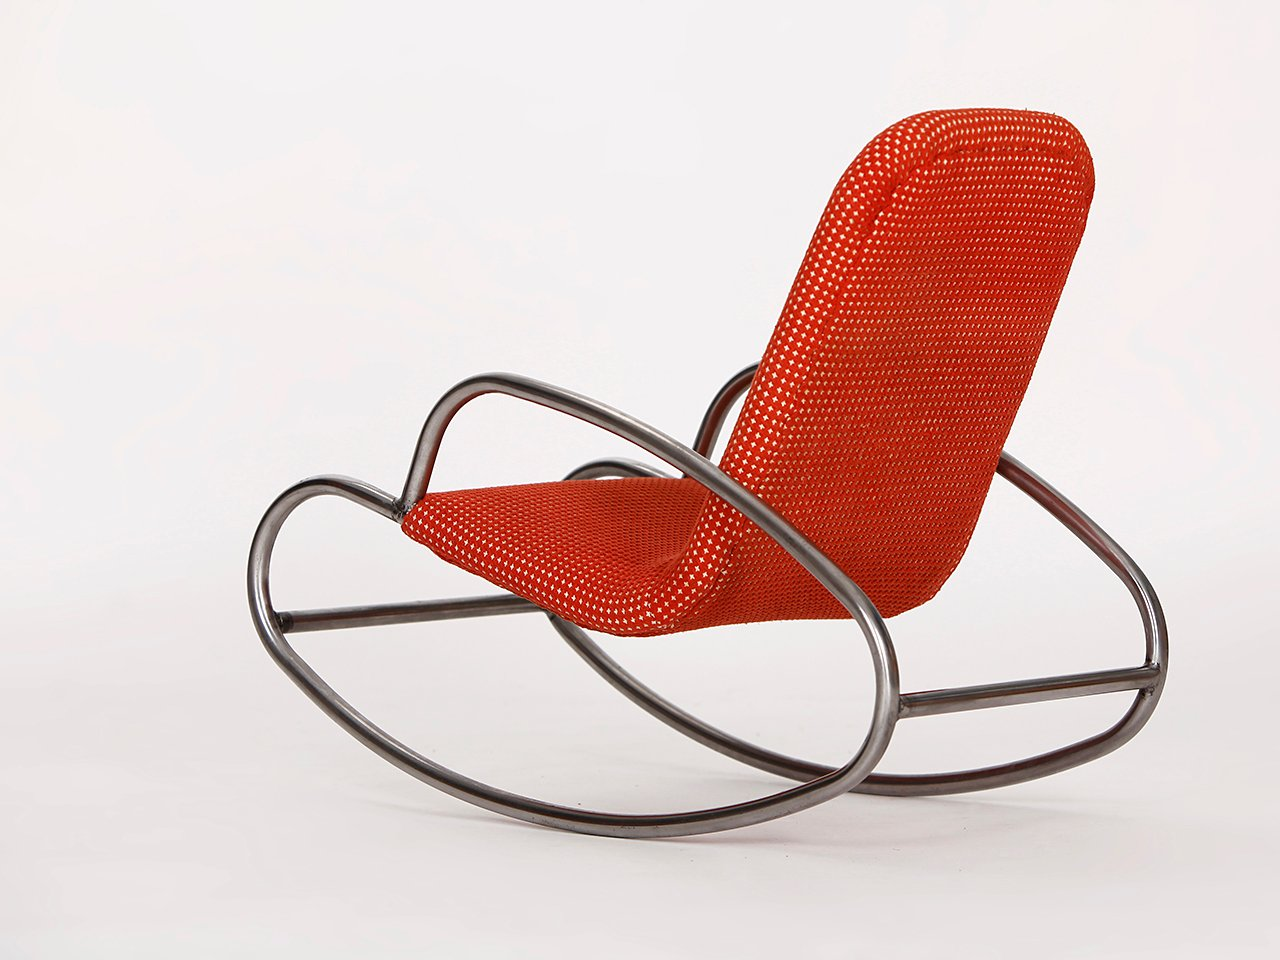 Good Childrenu0027s Rocking Chair, 1930s 6. $1,142.00. Price Per Piece